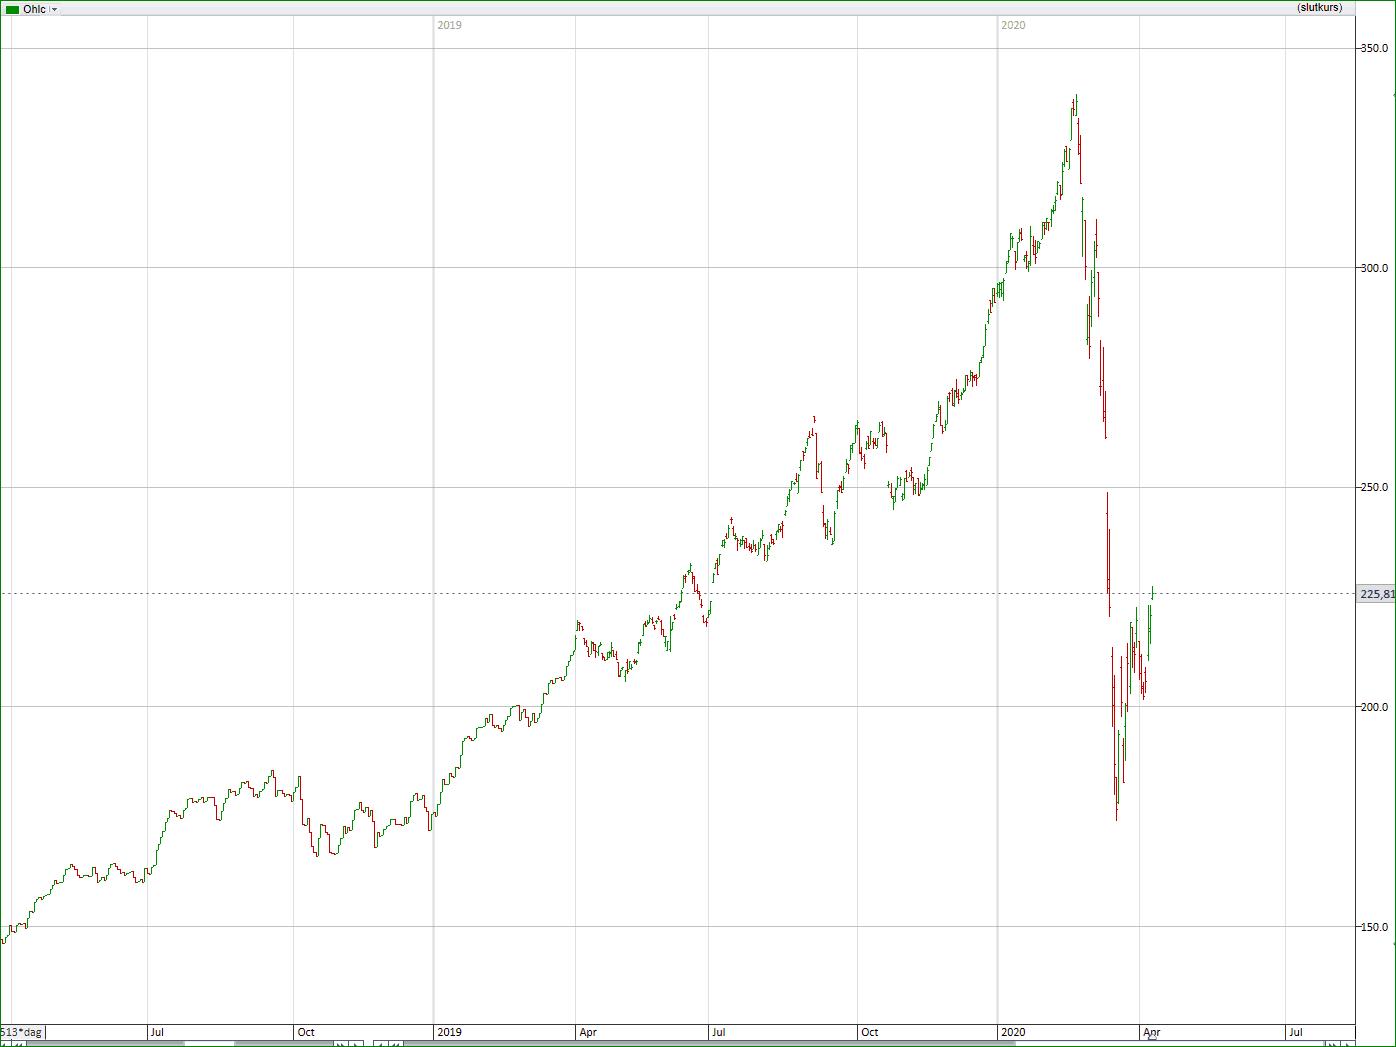 Fastighetsaktieindex